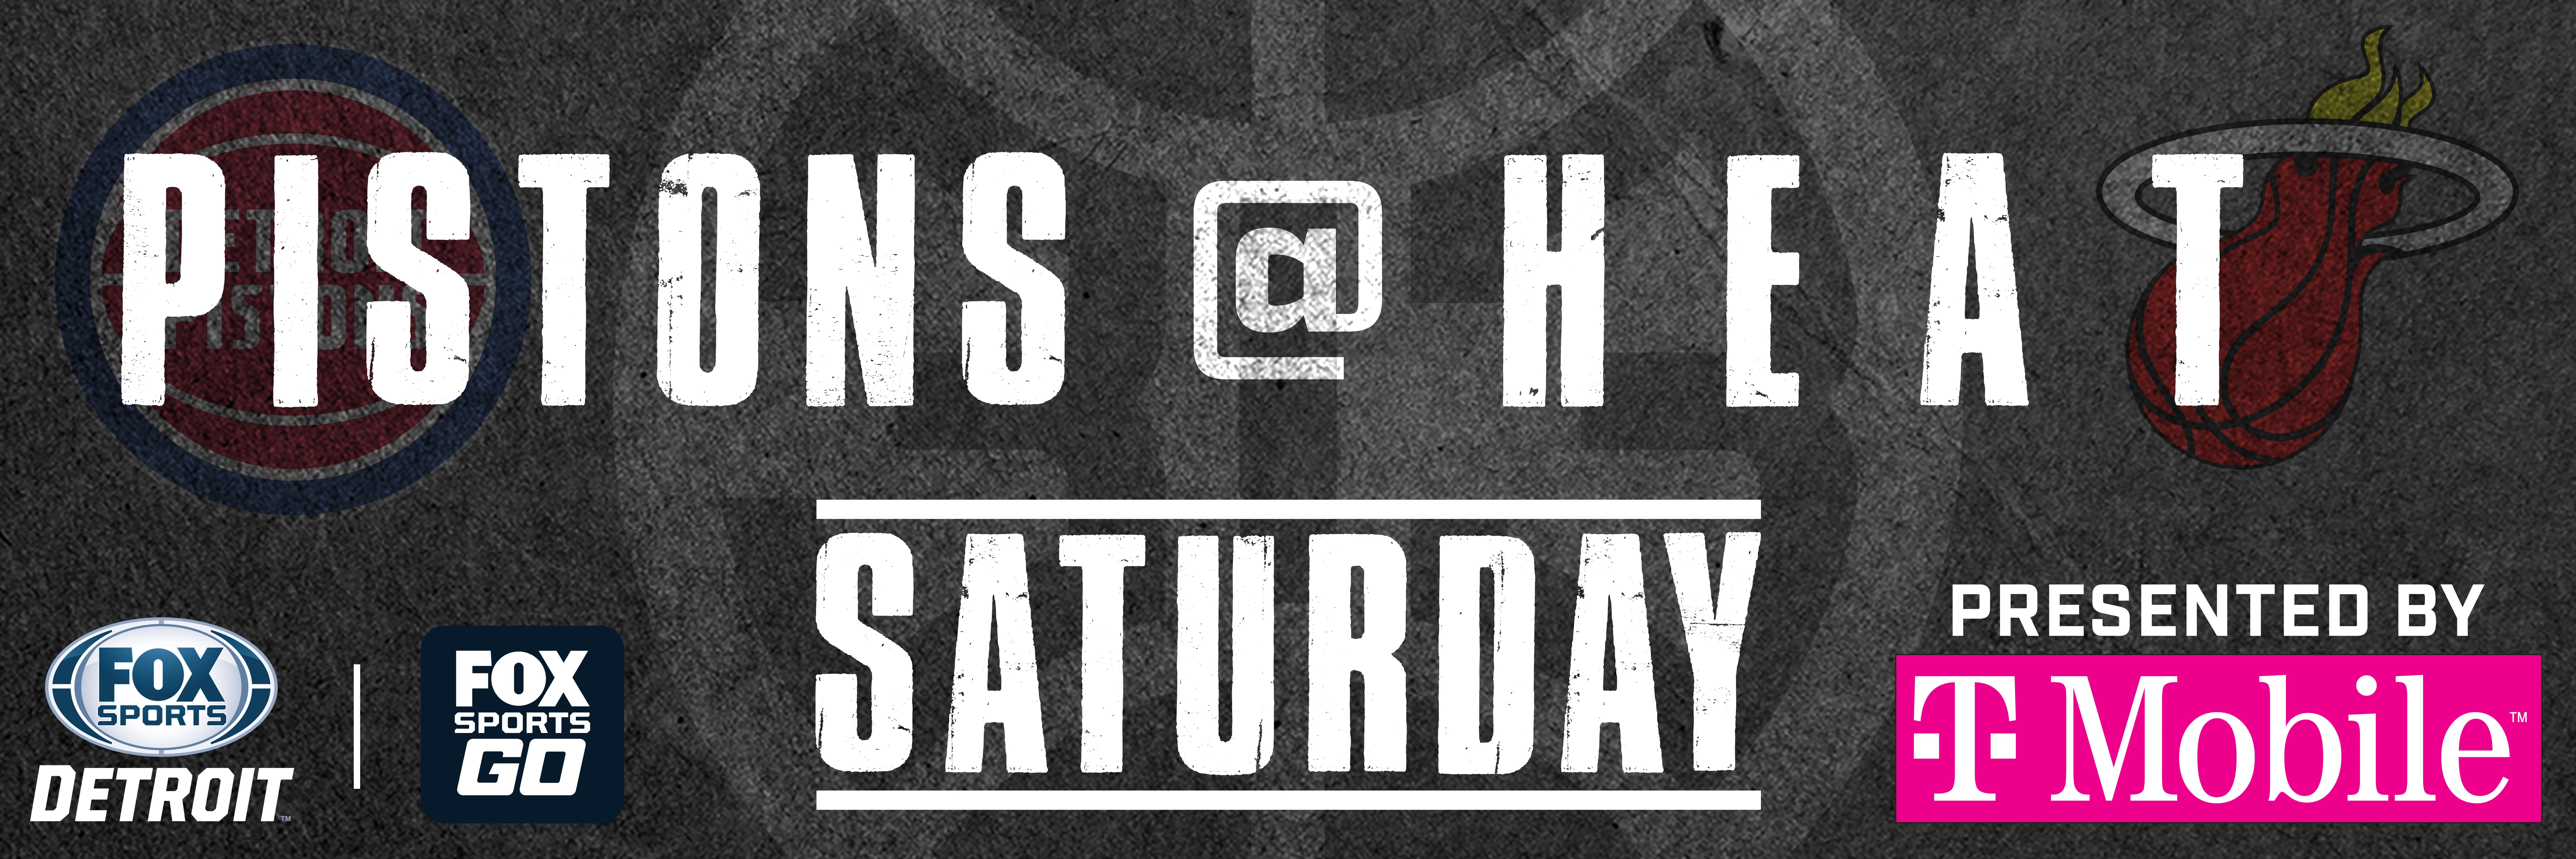 Pistons - T-Mobile Banner Template - Pistons Heat 1.16